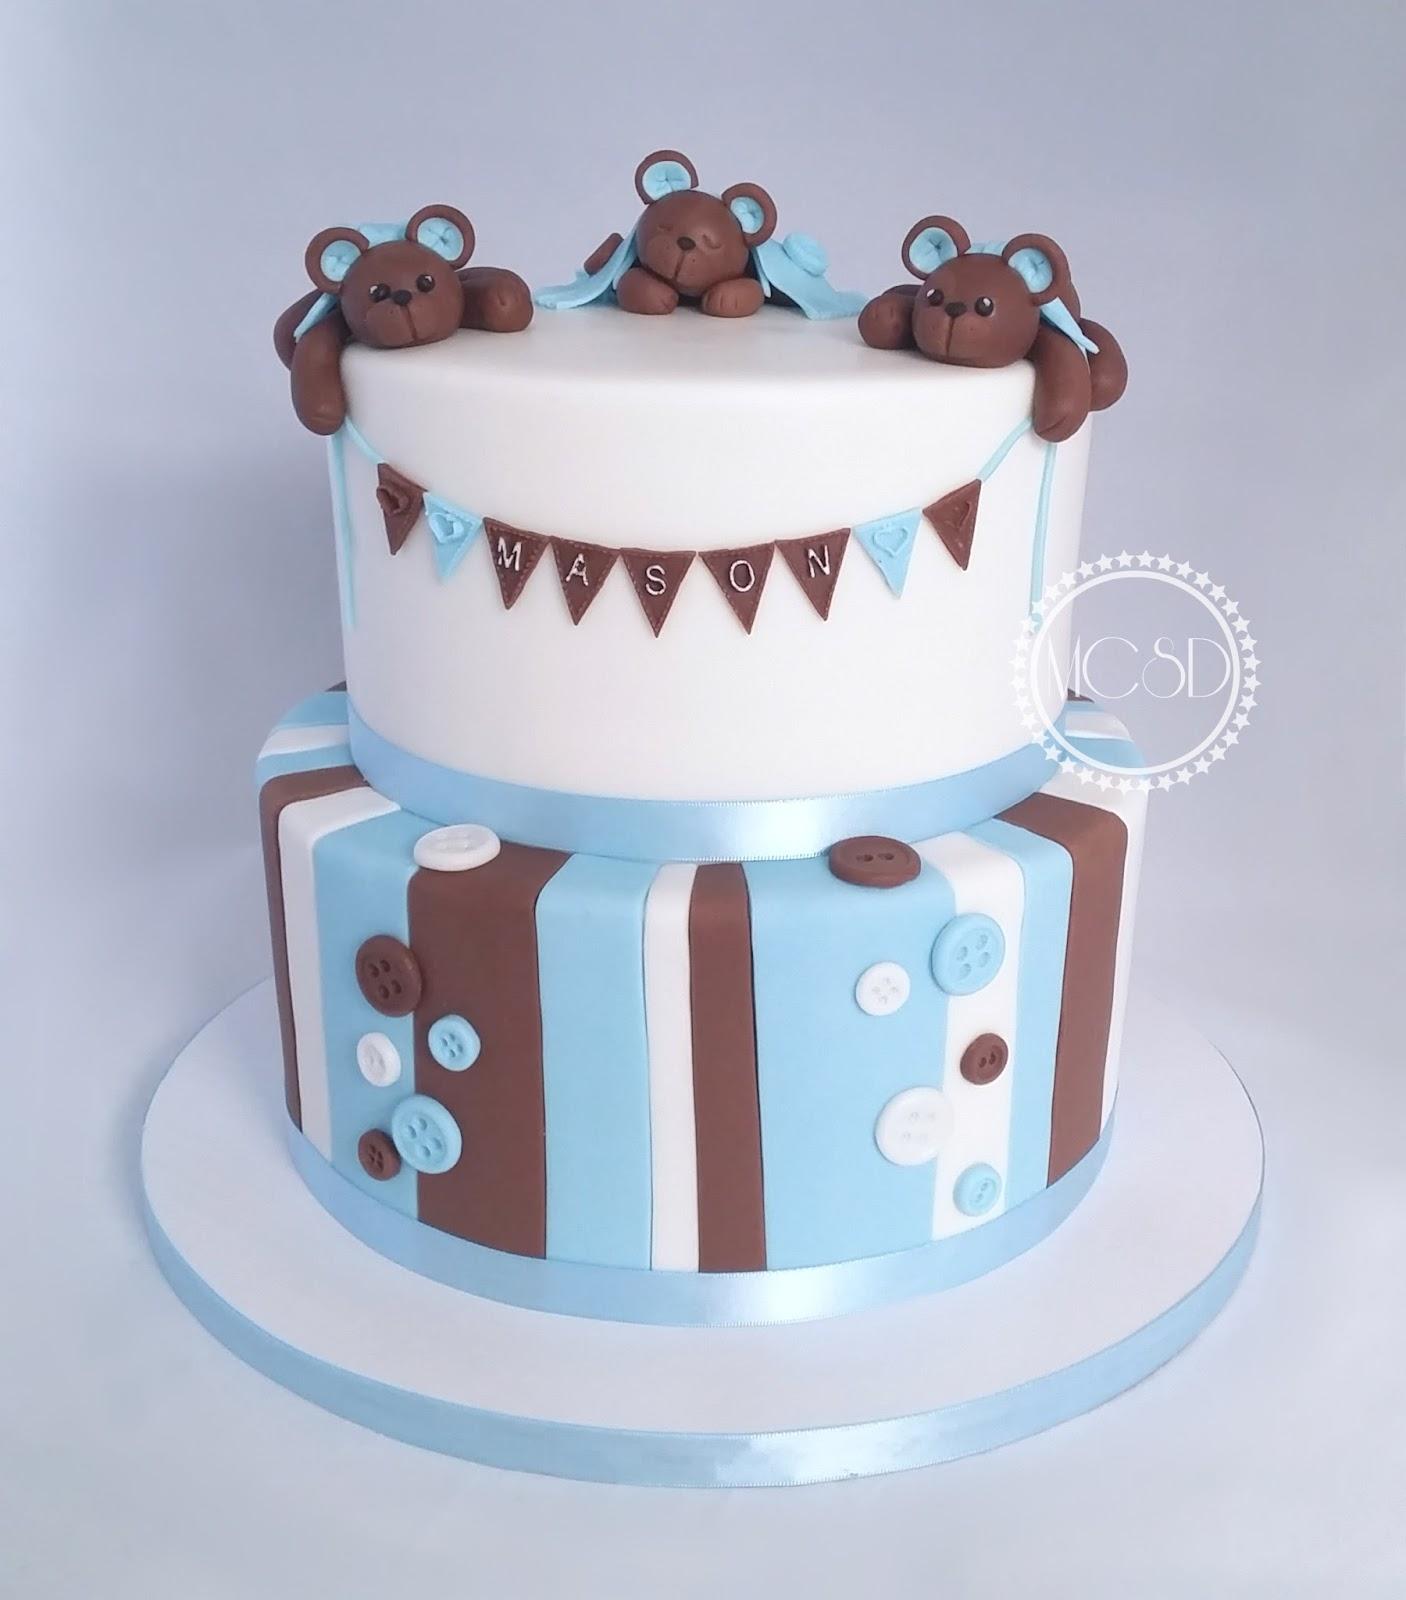 My Cake Sweet Dreams Cute Teddy Bear Baby Shower Cake With Stripes